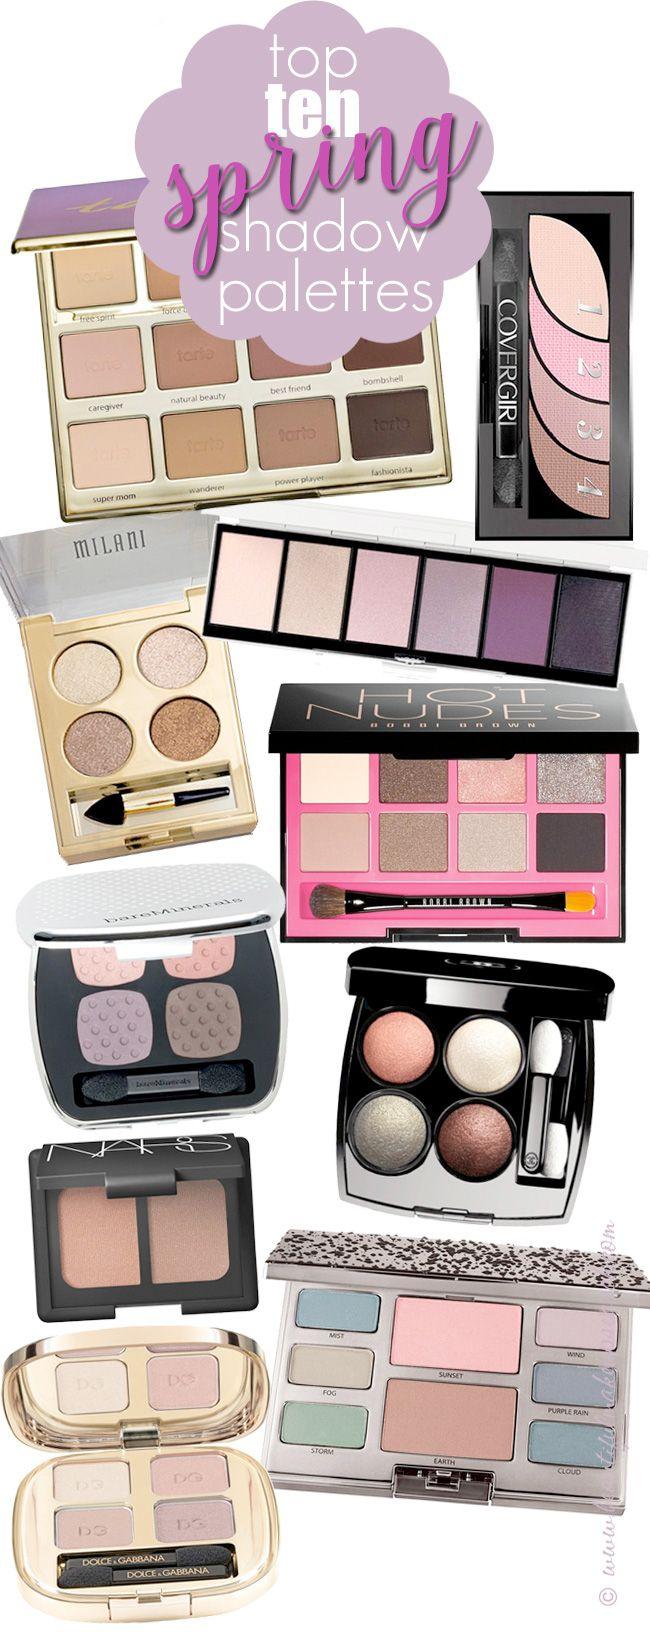 Top 10 Spring Eyeshadow Palettes.